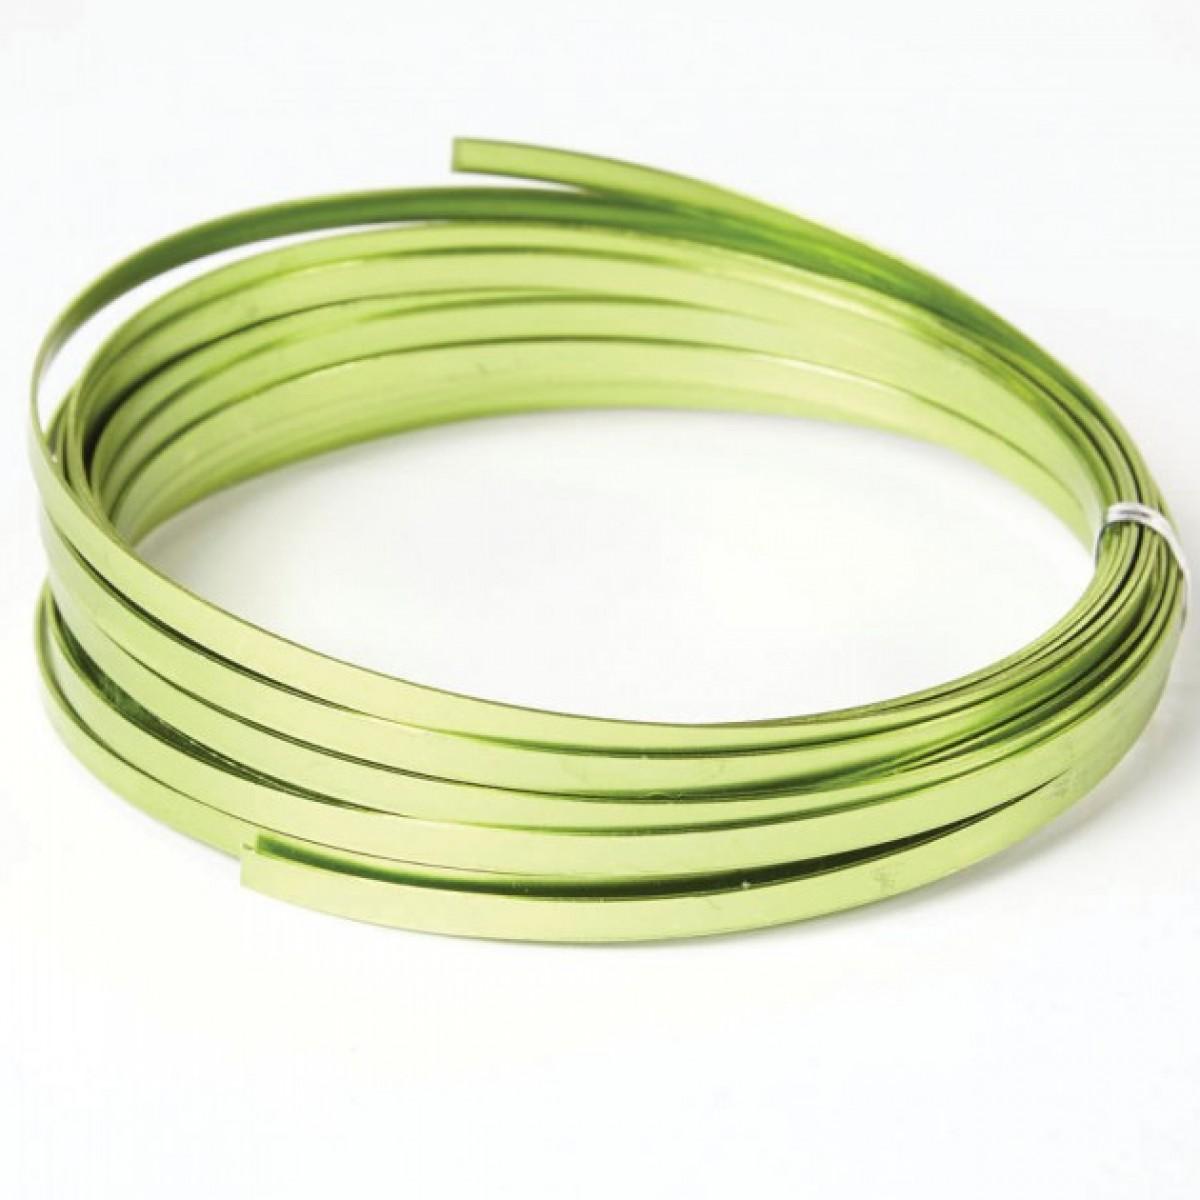 Flat Aluminium Wire Apple Green 1mmx5mmx100g 1 No